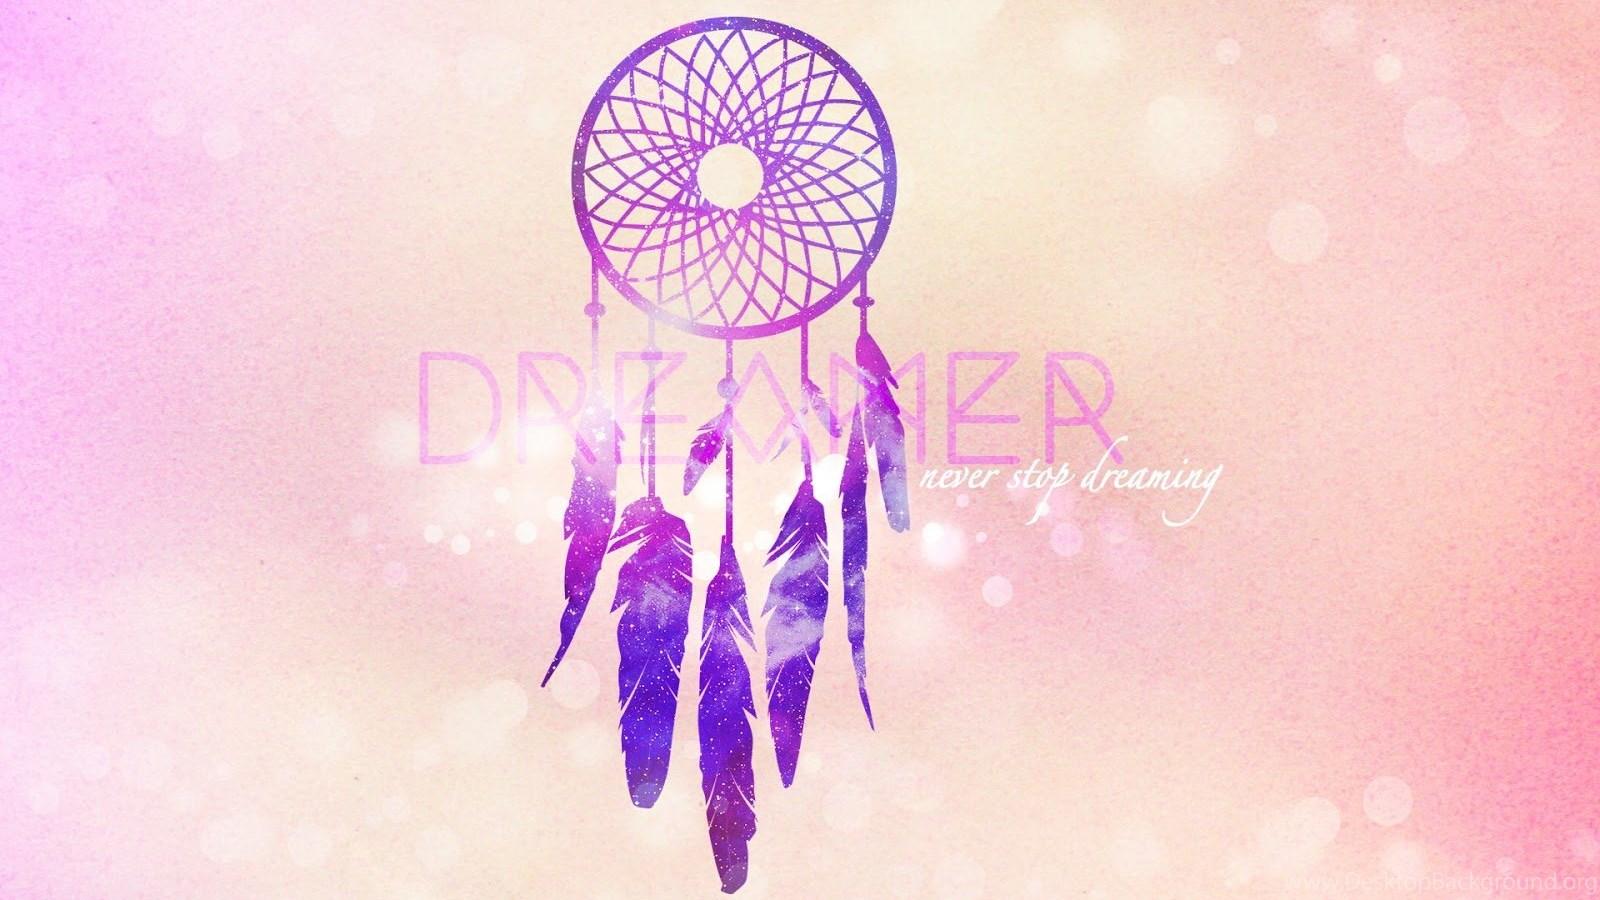 Dreamcatcher background for computer